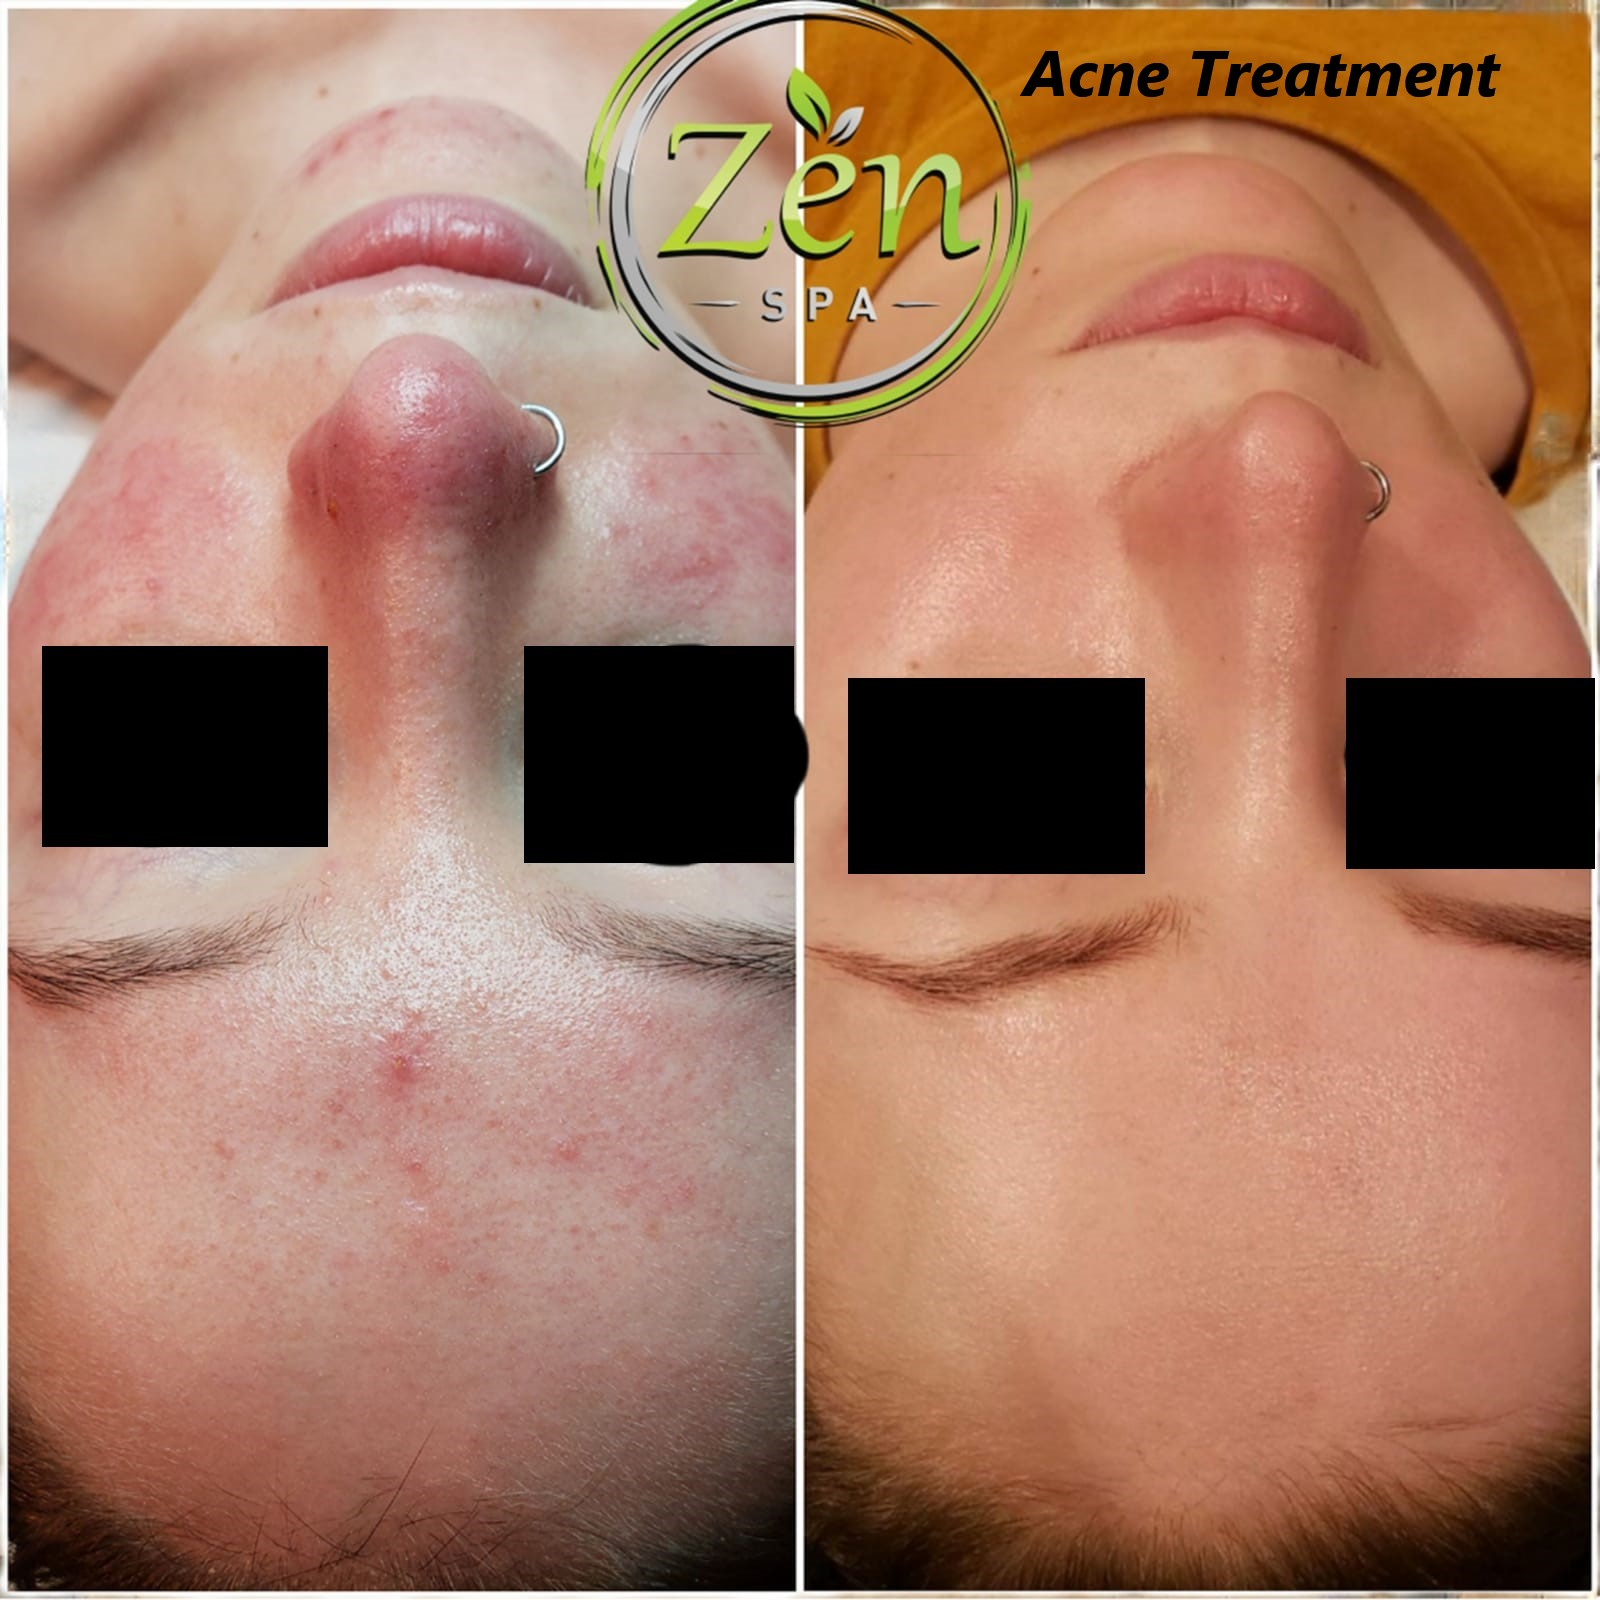 Acne Treatment 1